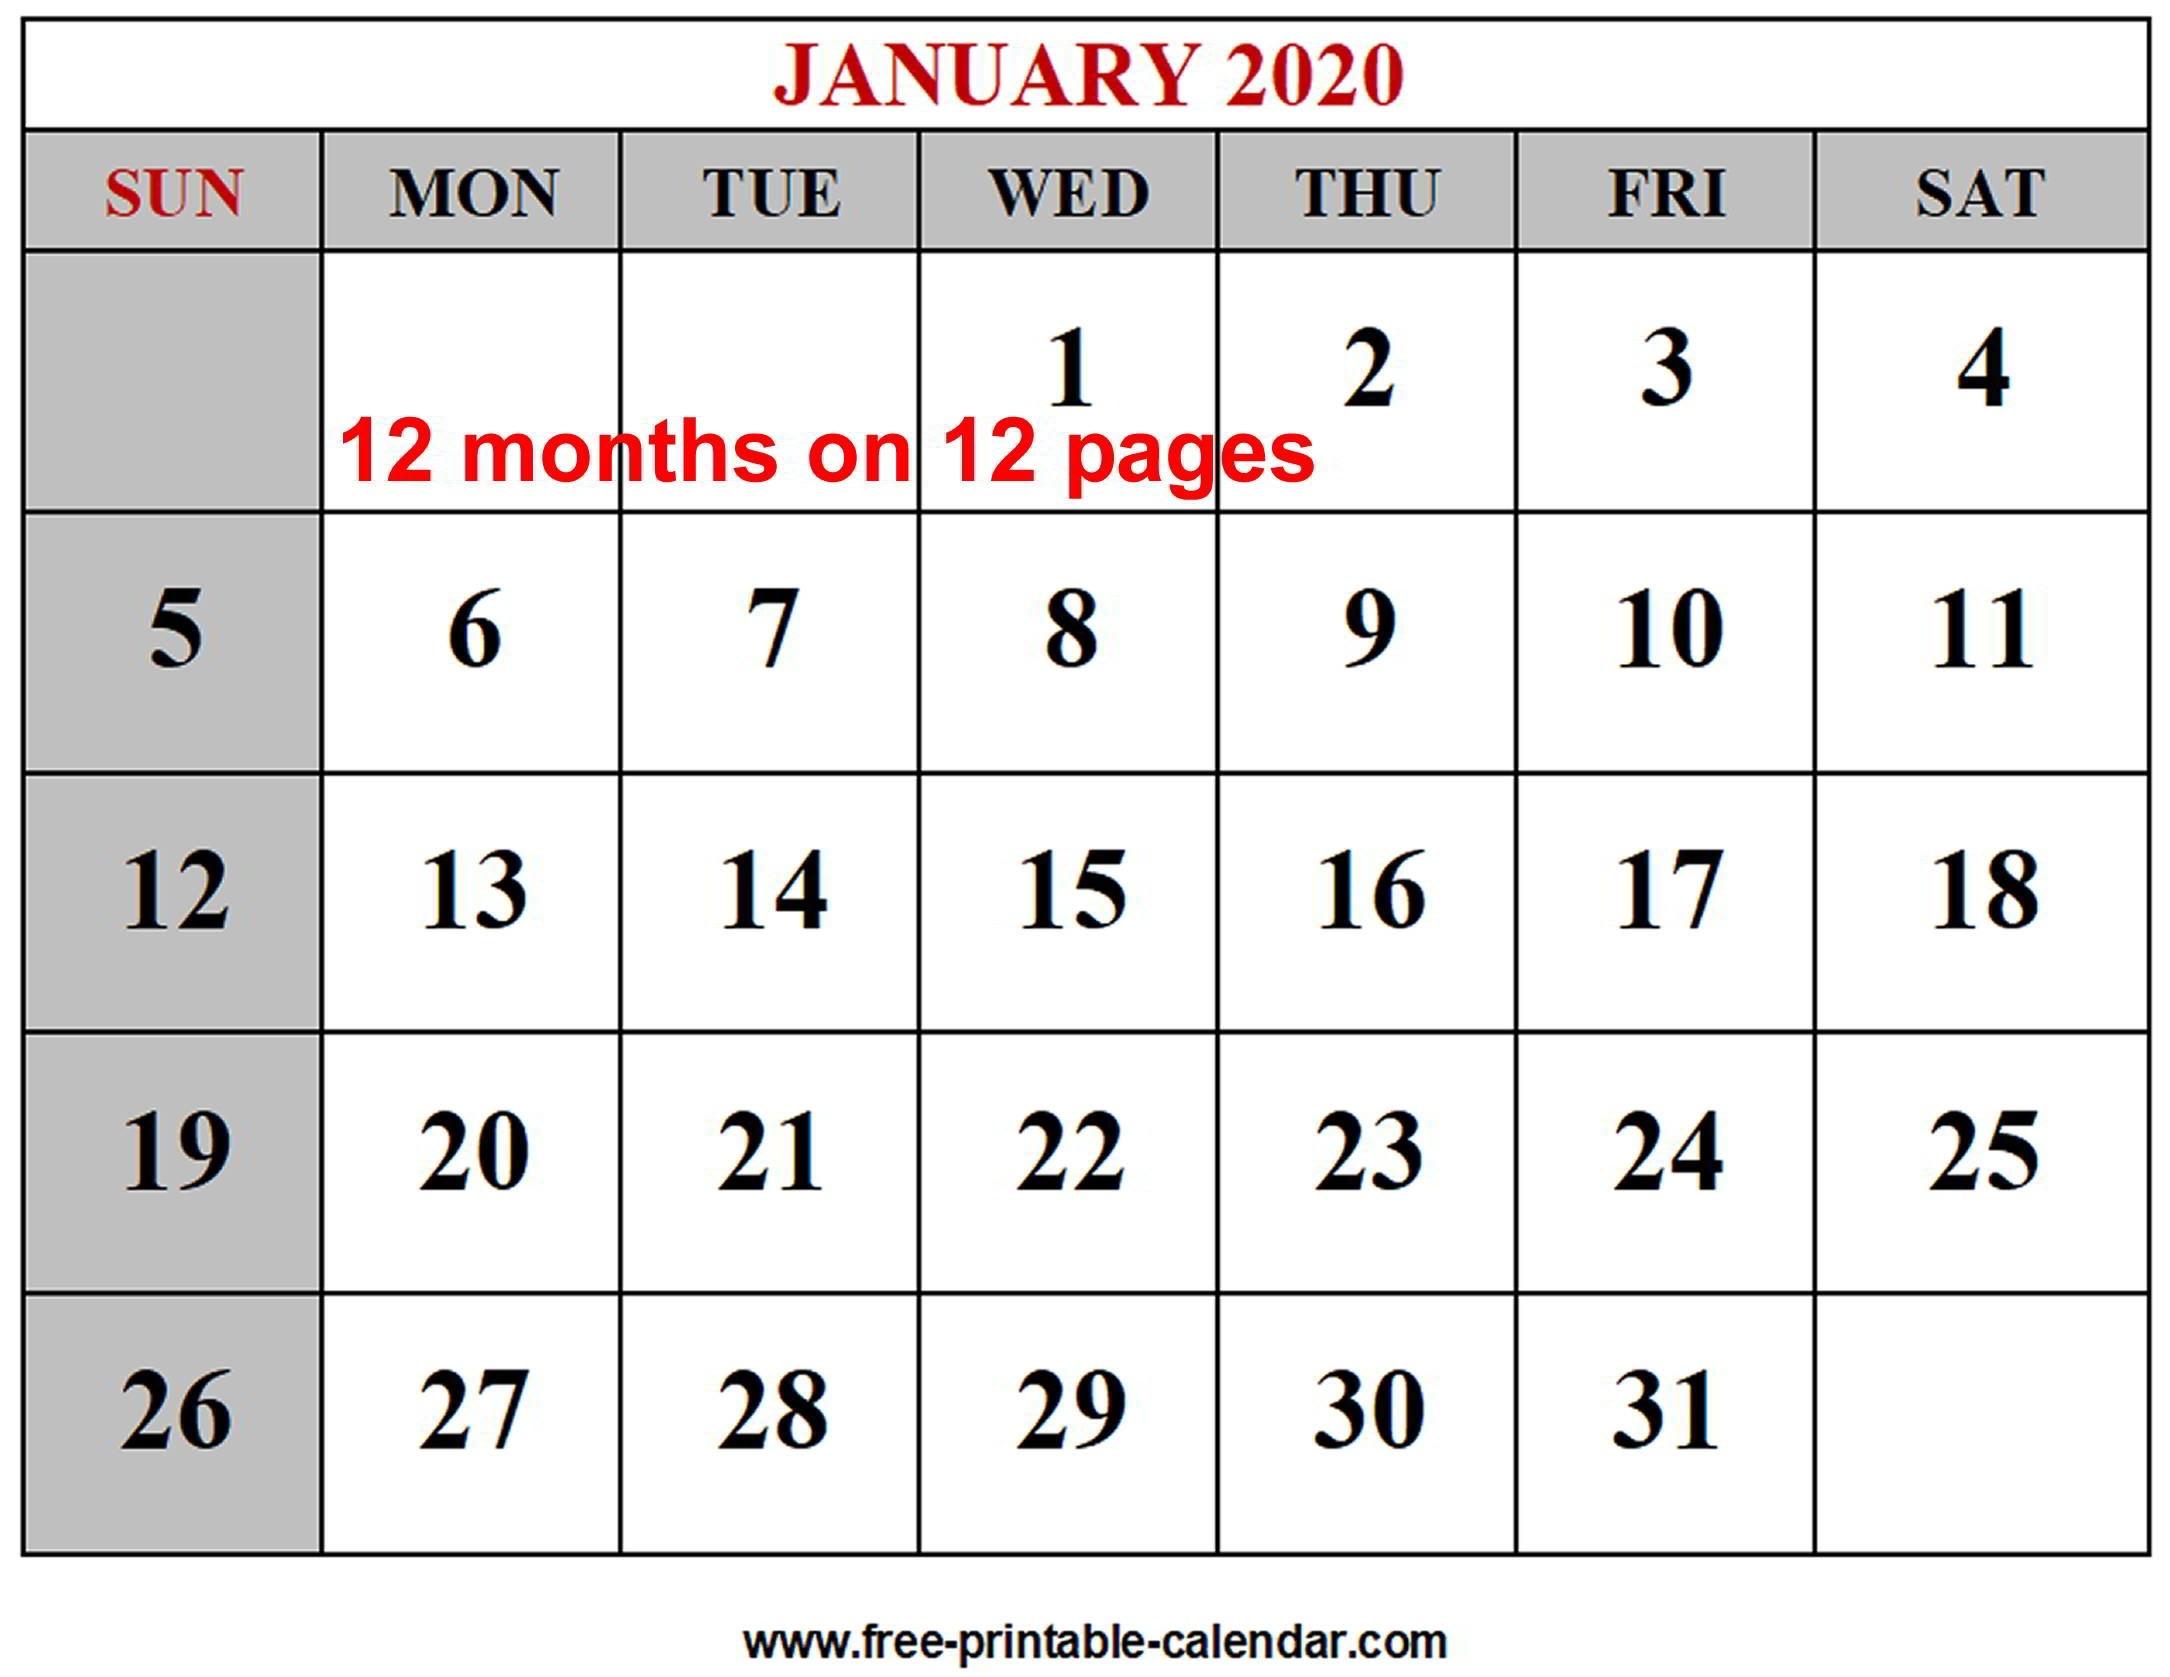 Year 2020 Calendar Templates - Free-Printable-Calendar  Printable Calendar Monthly 2020 Free